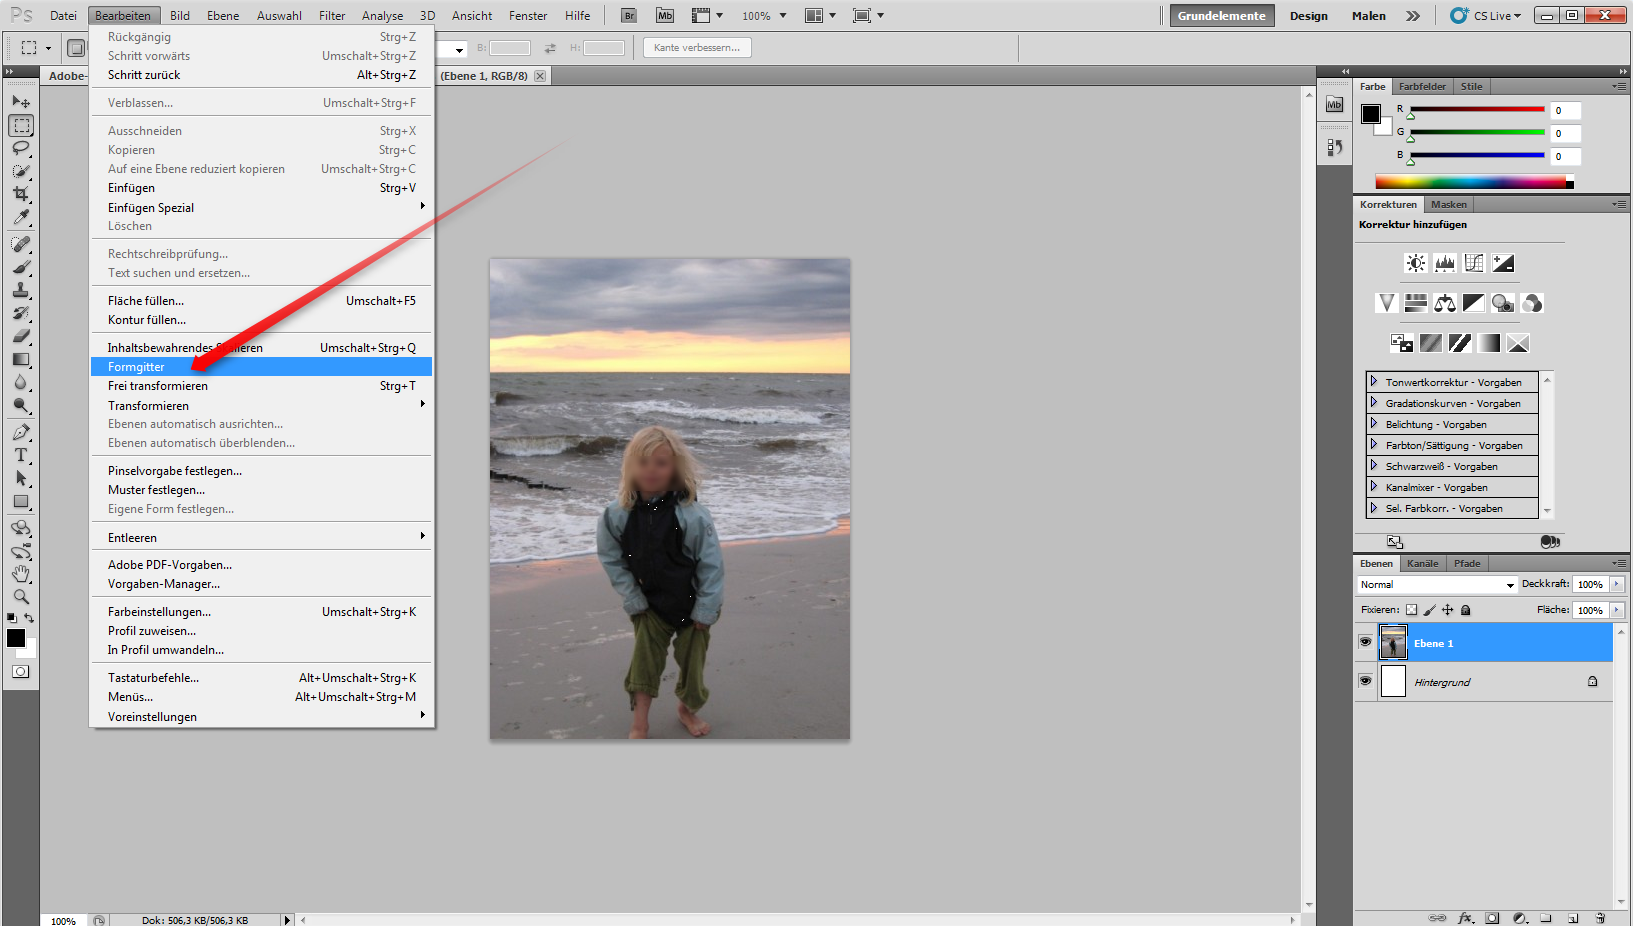 Adobe-Creative-Suite-5-PhotoshoCS5-Screenshot-Formgitter1-470.png